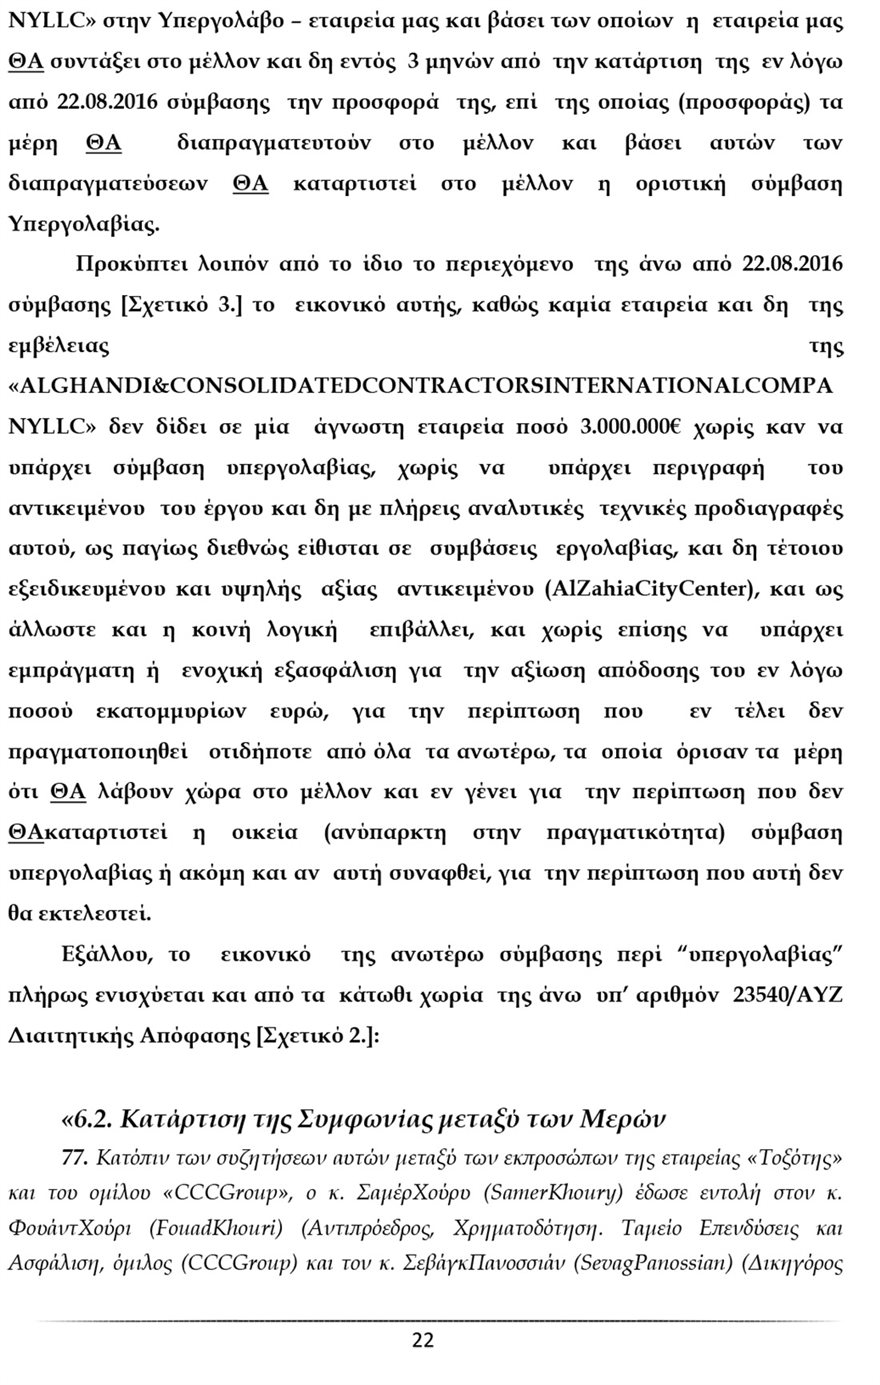 ypomnima-22